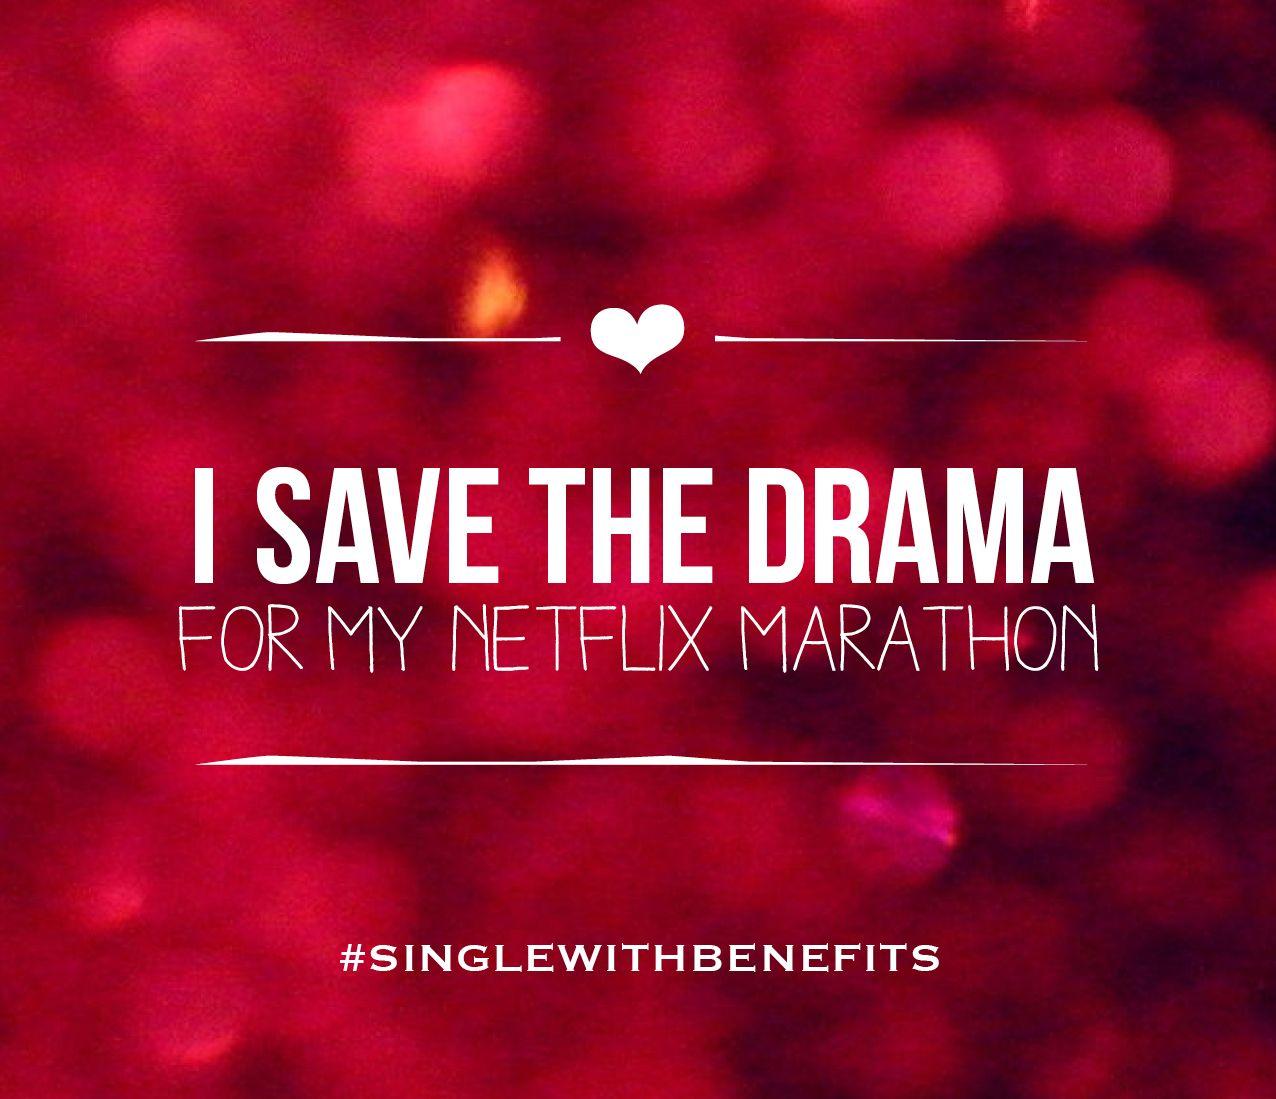 Singlewithbenefits Singlelife Diy Valentinesday Netflix Drama